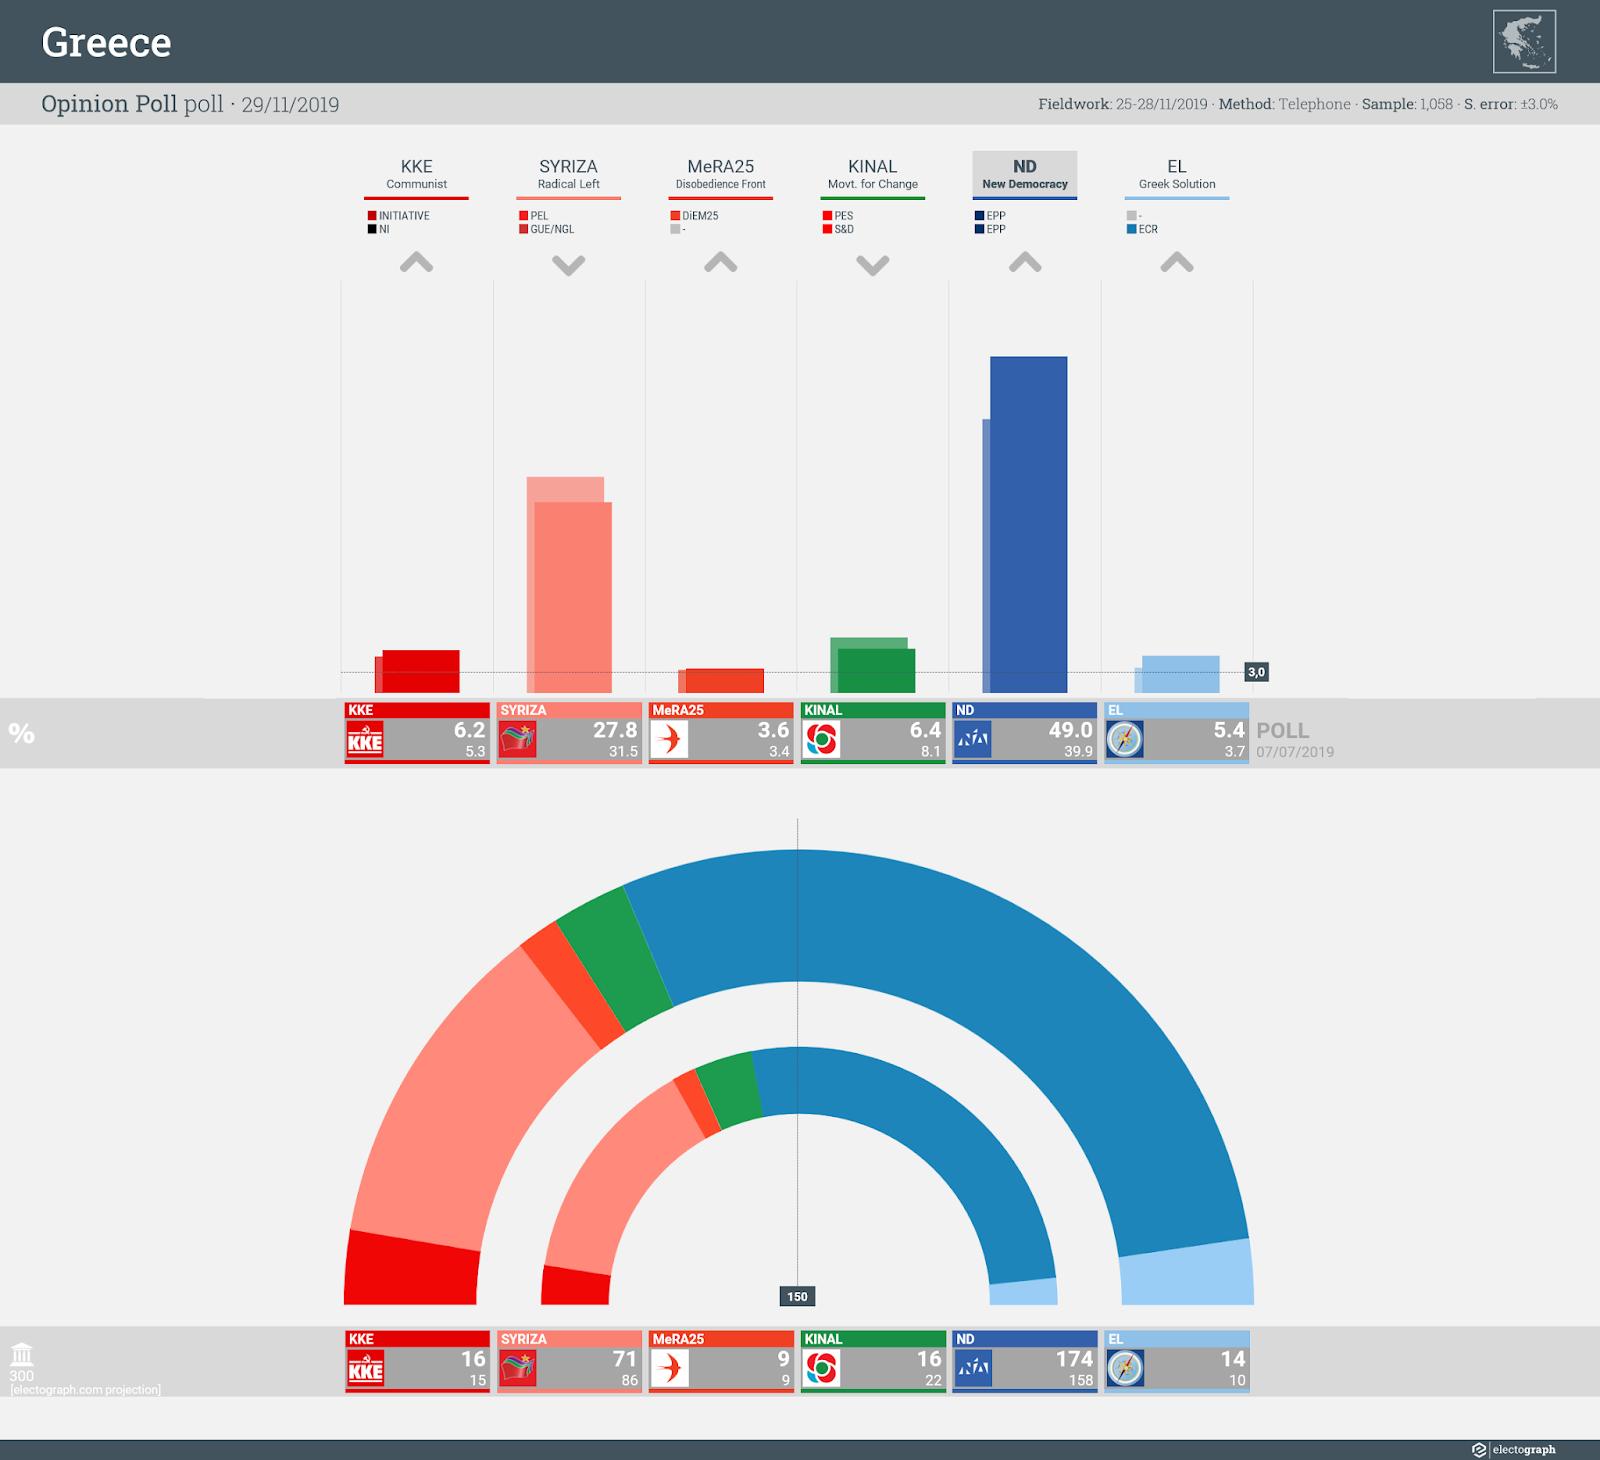 GREECE: Opinion Poll poll chart, 29 November 2019